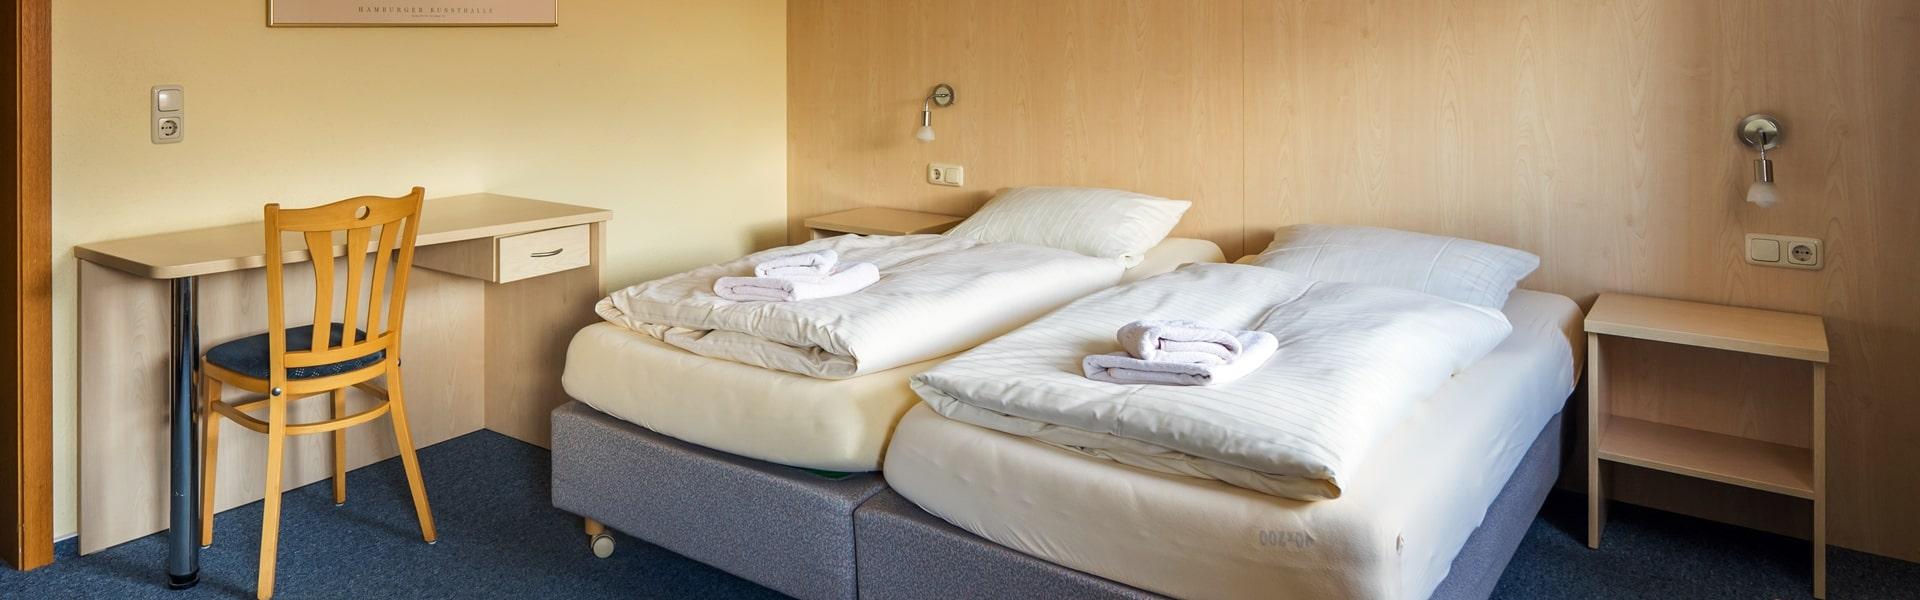 Zimmer im Hotel Catharinenberg